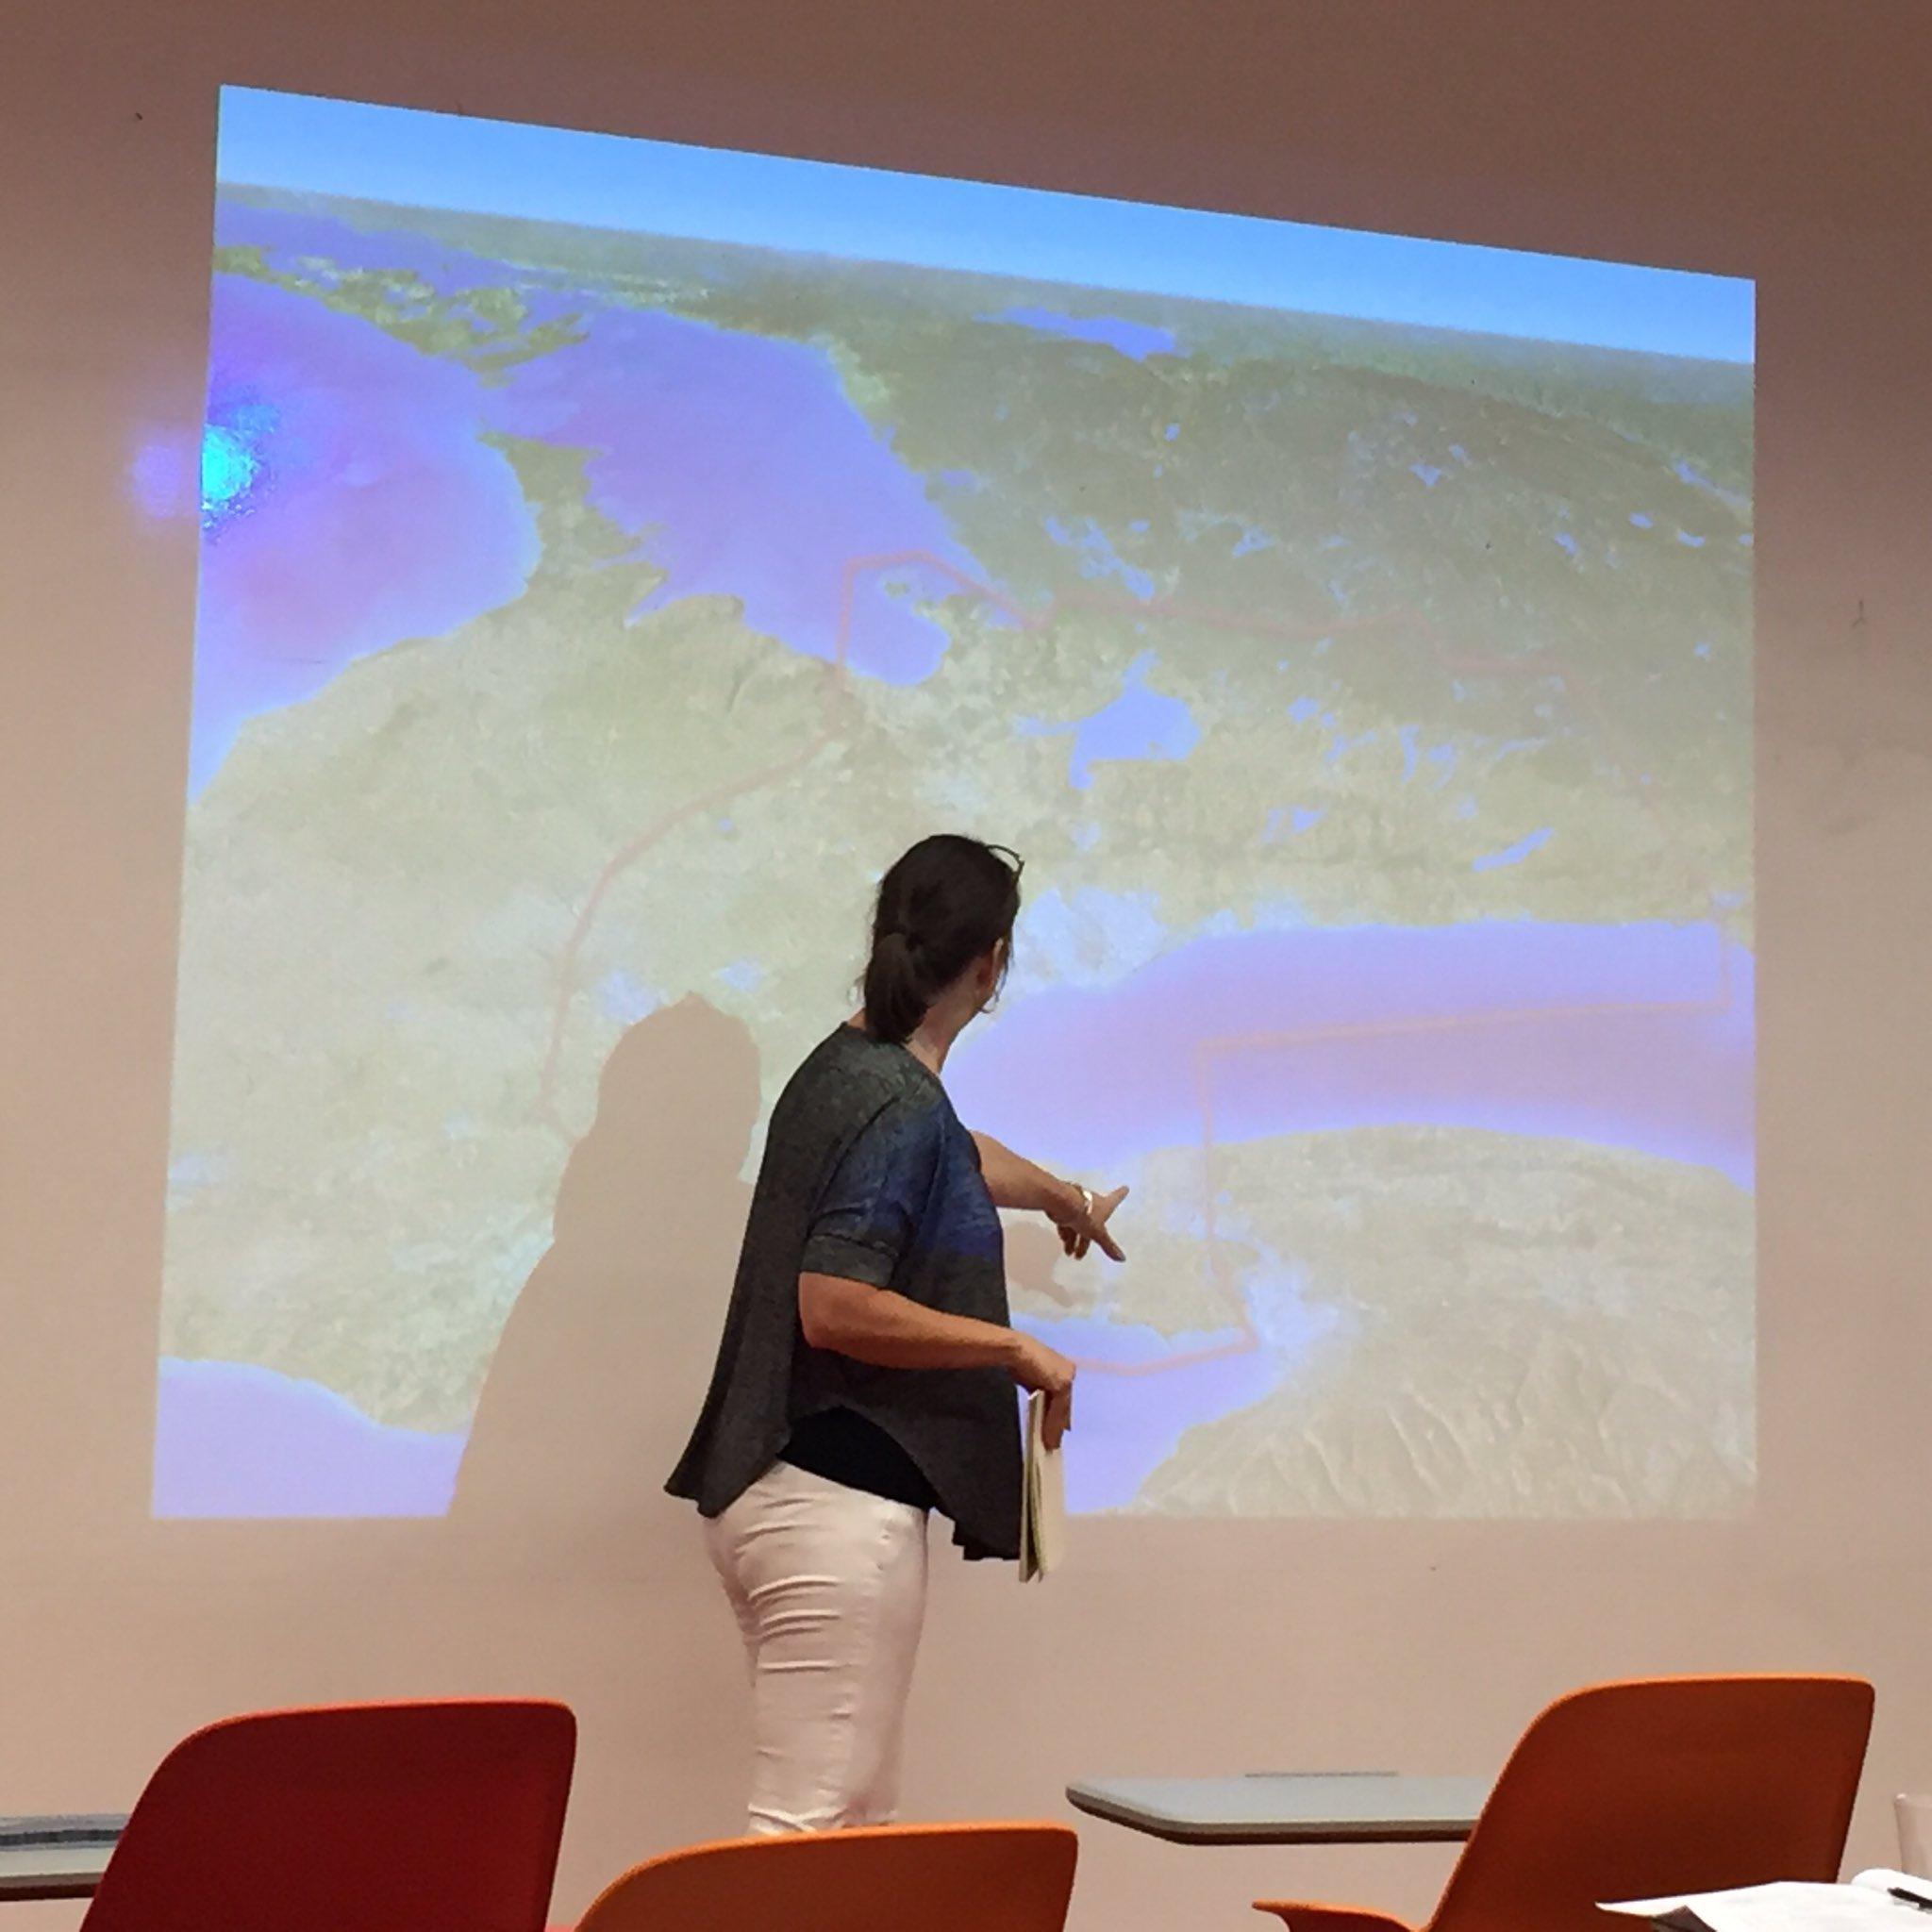 very powerful interactive mapping /info Geoweb tool by @NeptisRegions w/ Marcy Burchfield https://t.co/fQvb0LIVZw https://t.co/YbkK0h1zz2